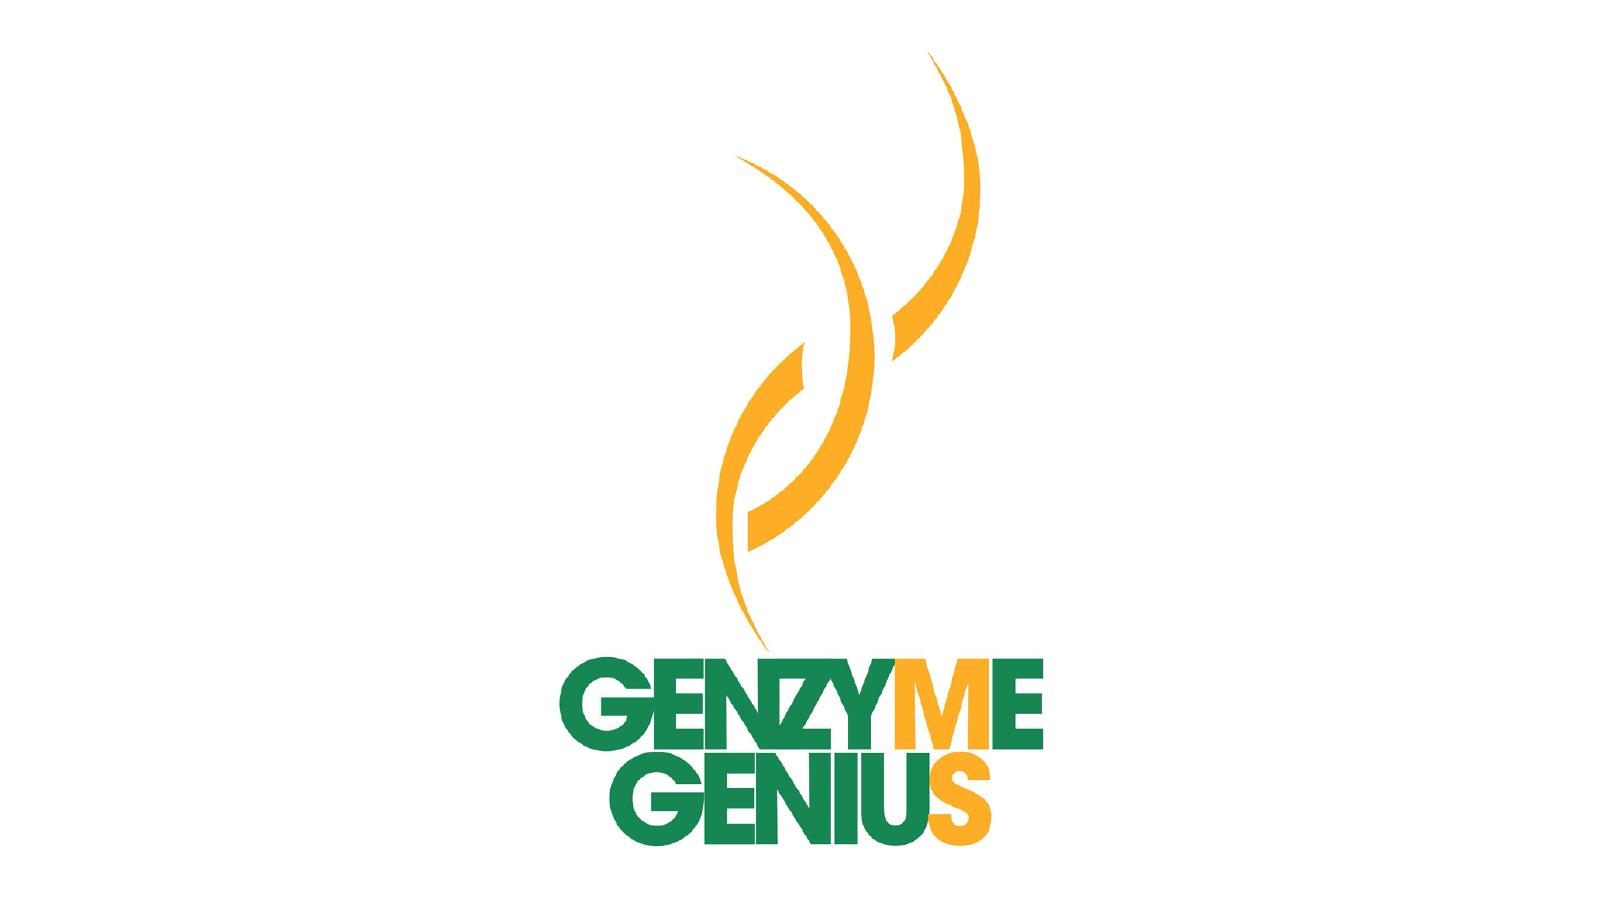 Genzyme Genius Award Flame Logo Concept